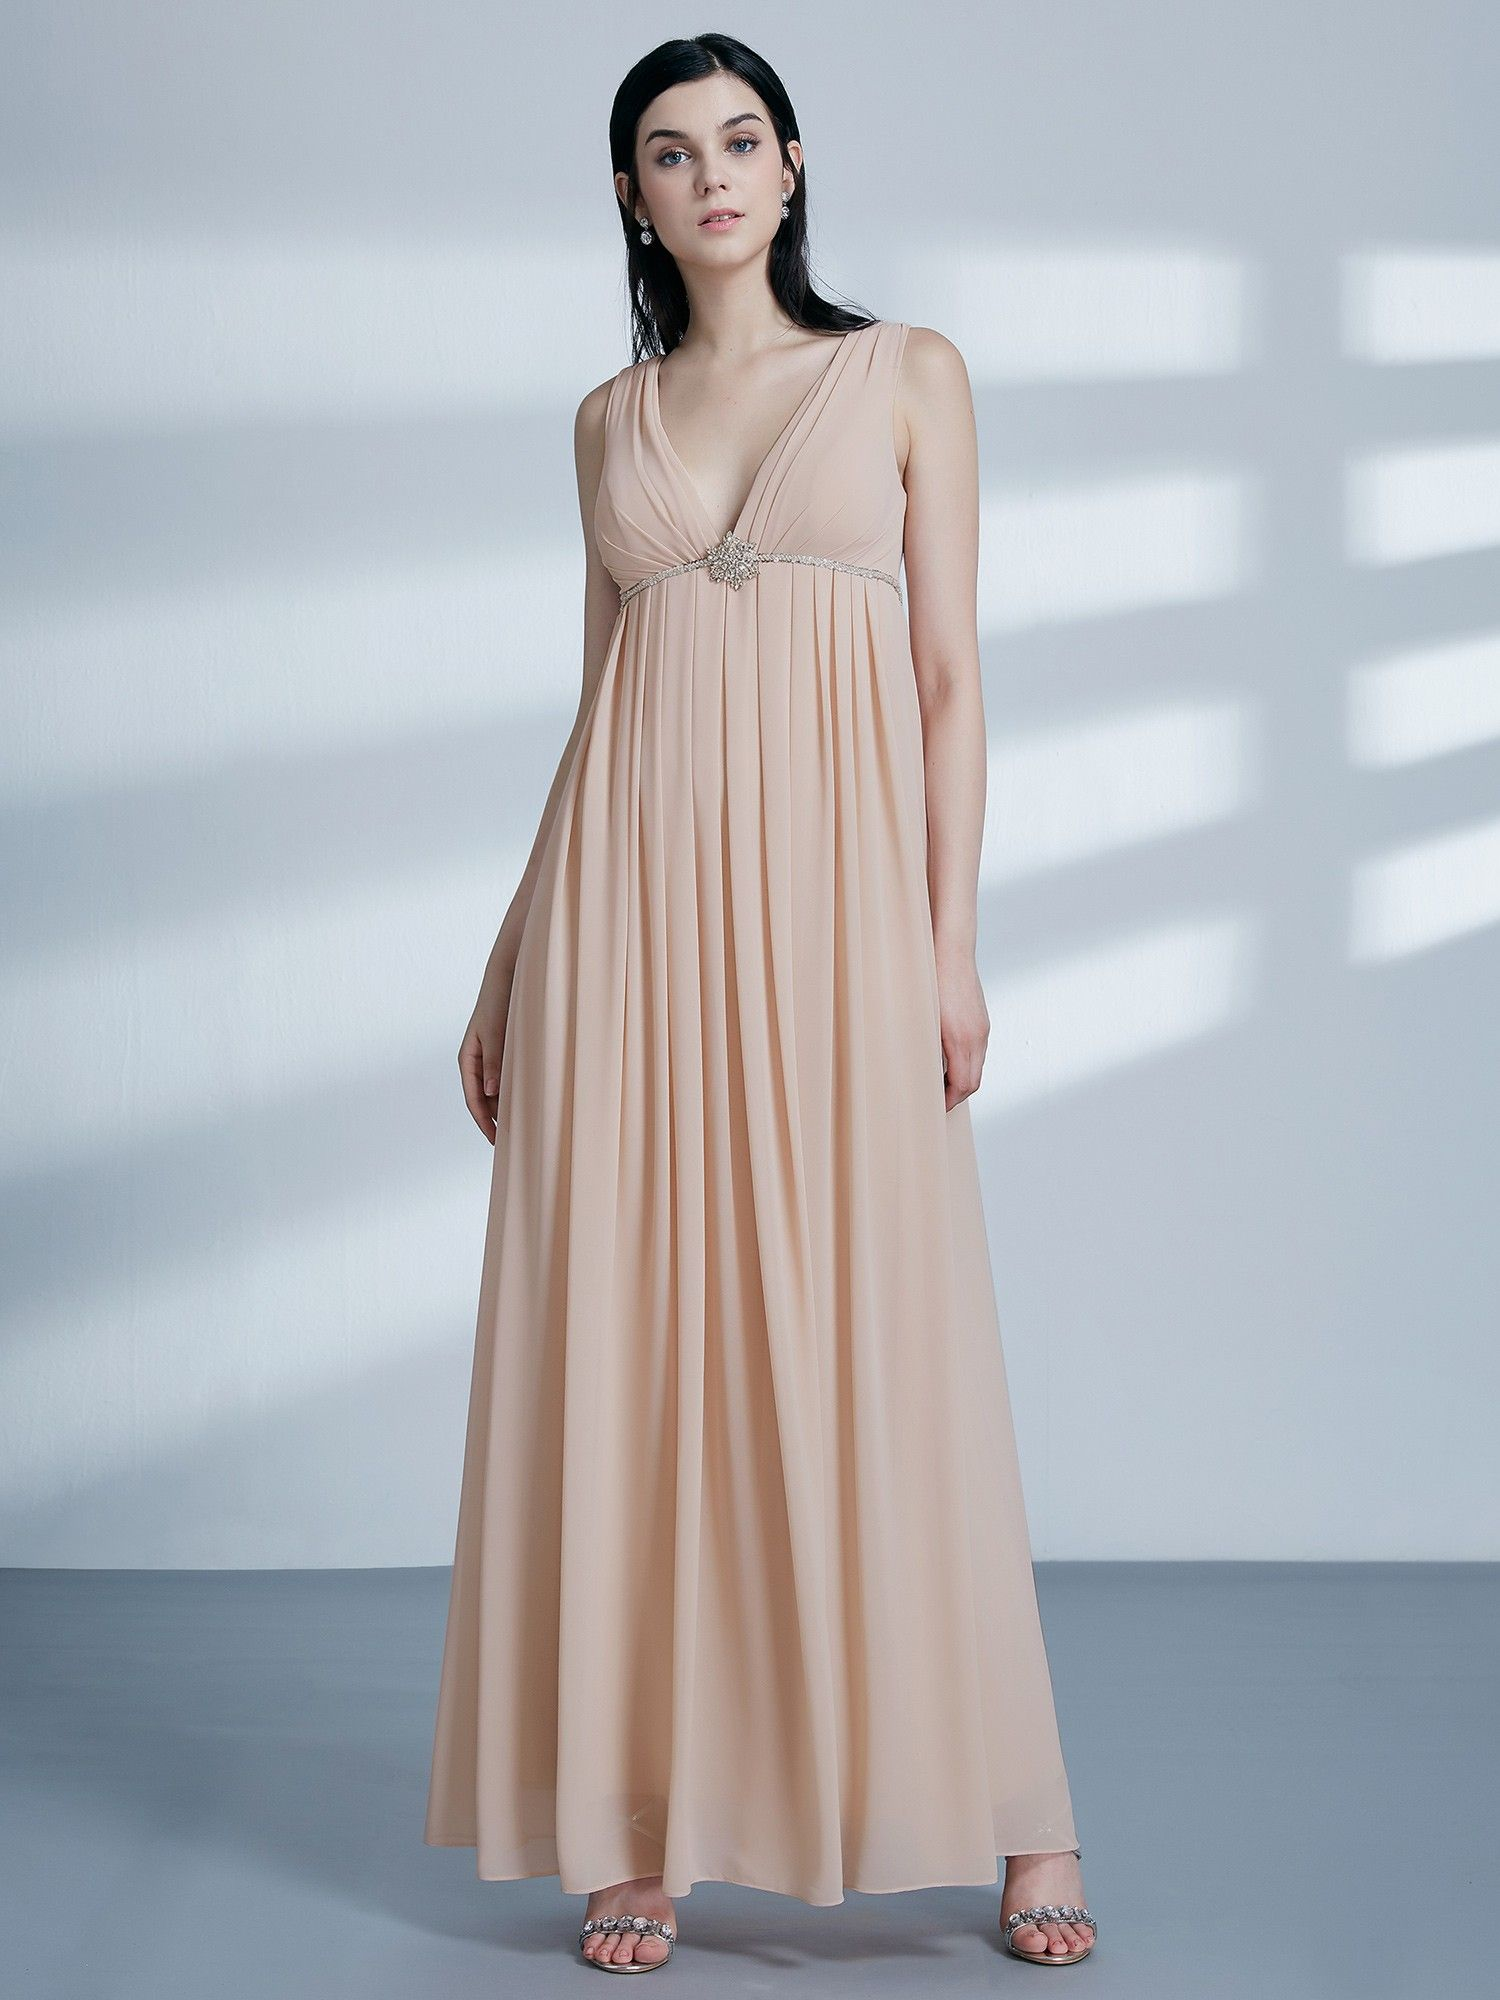 d920a7cd7c62d V Neck Empire Waist Long Bridesmaid Dress | Ever-Pretty #bridesmaids  #bridesmaid #weddingidea #weddingideas #chiffondress #EverPretty